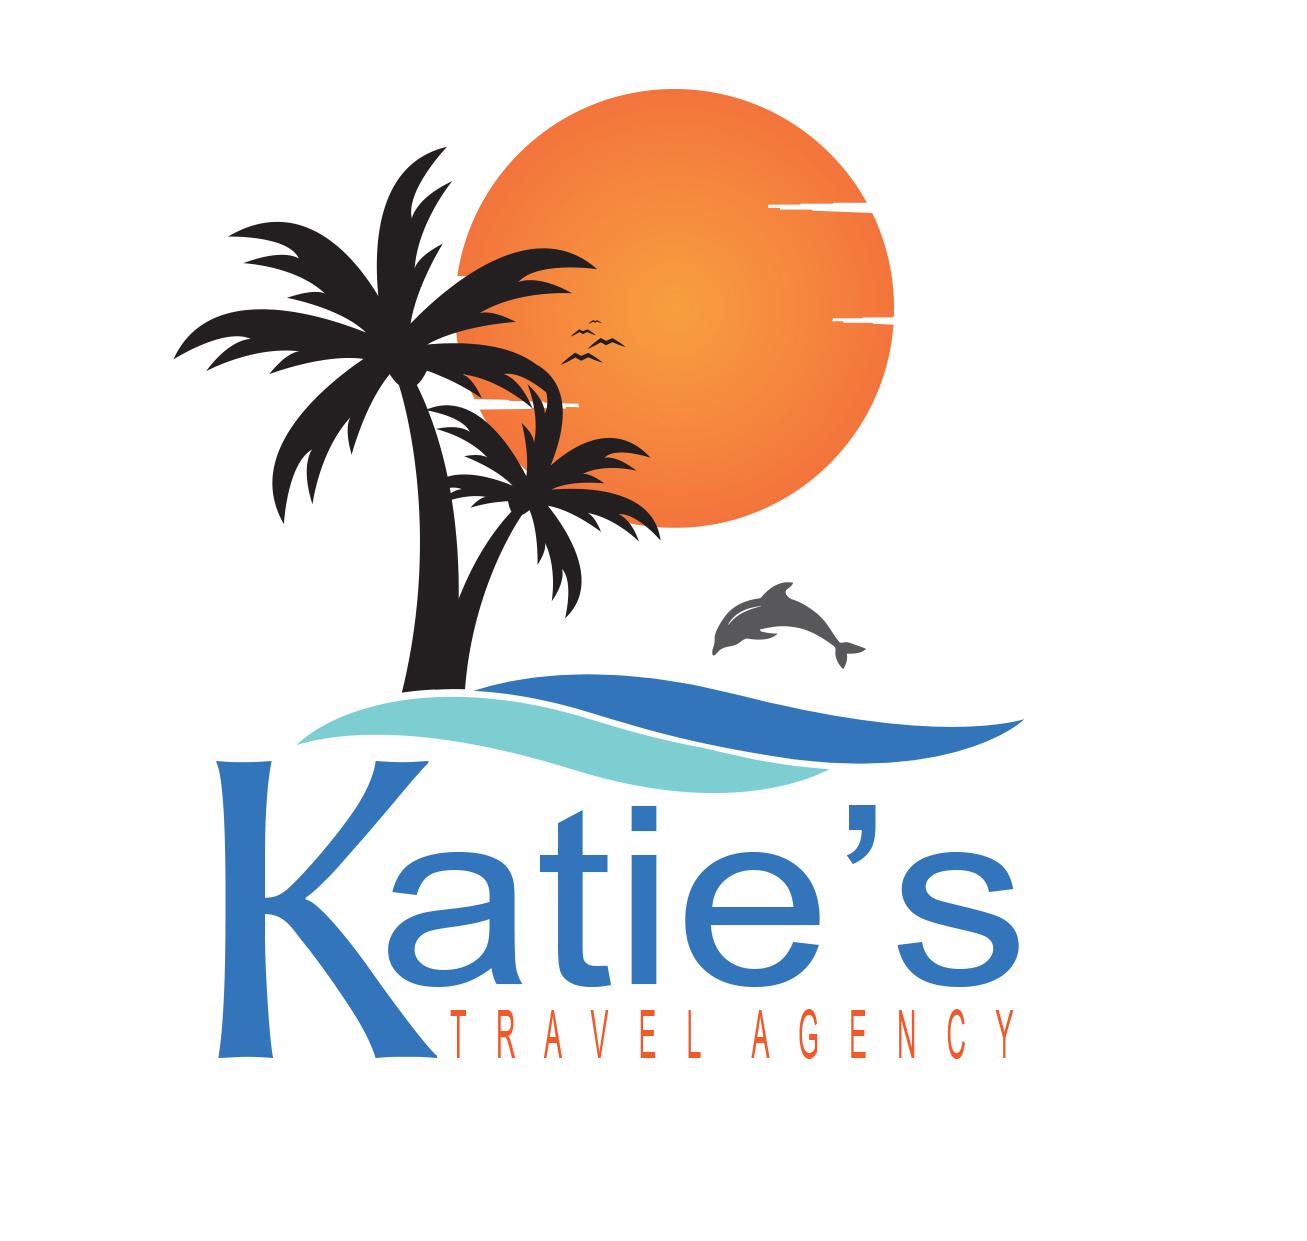 Katie's Travel Agency